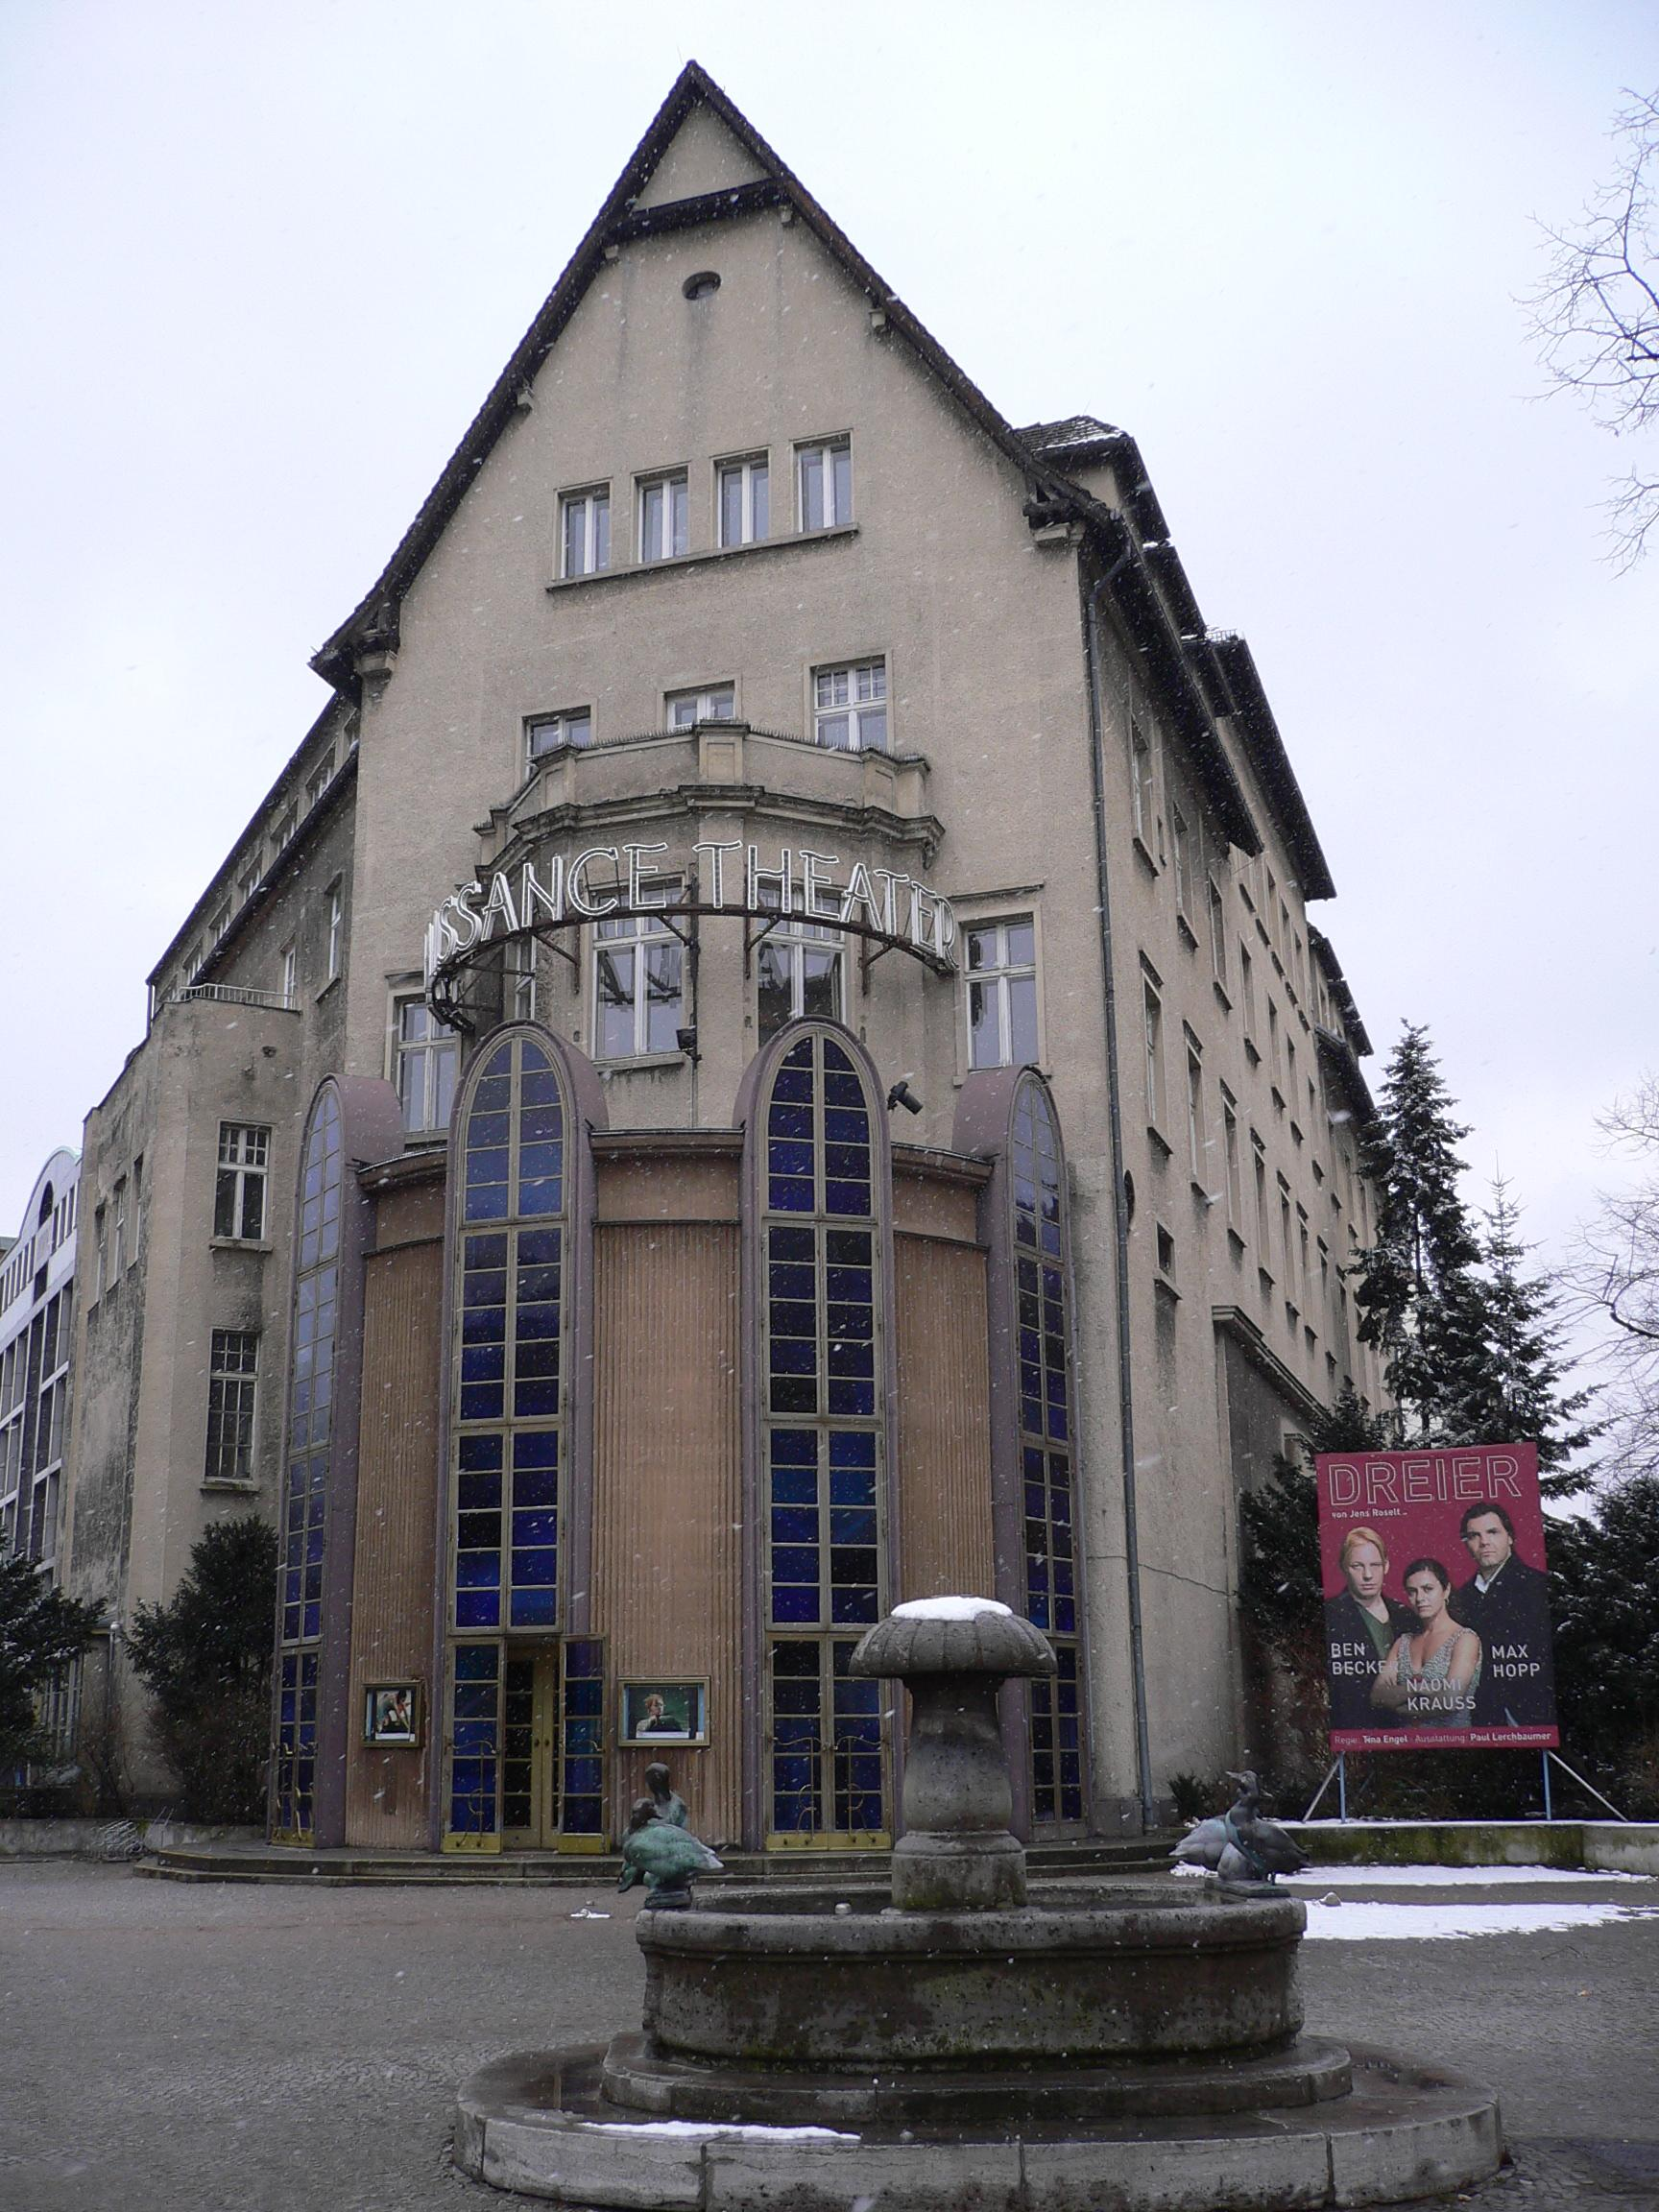 file berlin charlottenburg renaissance theater 20050226 wikimedia commons. Black Bedroom Furniture Sets. Home Design Ideas